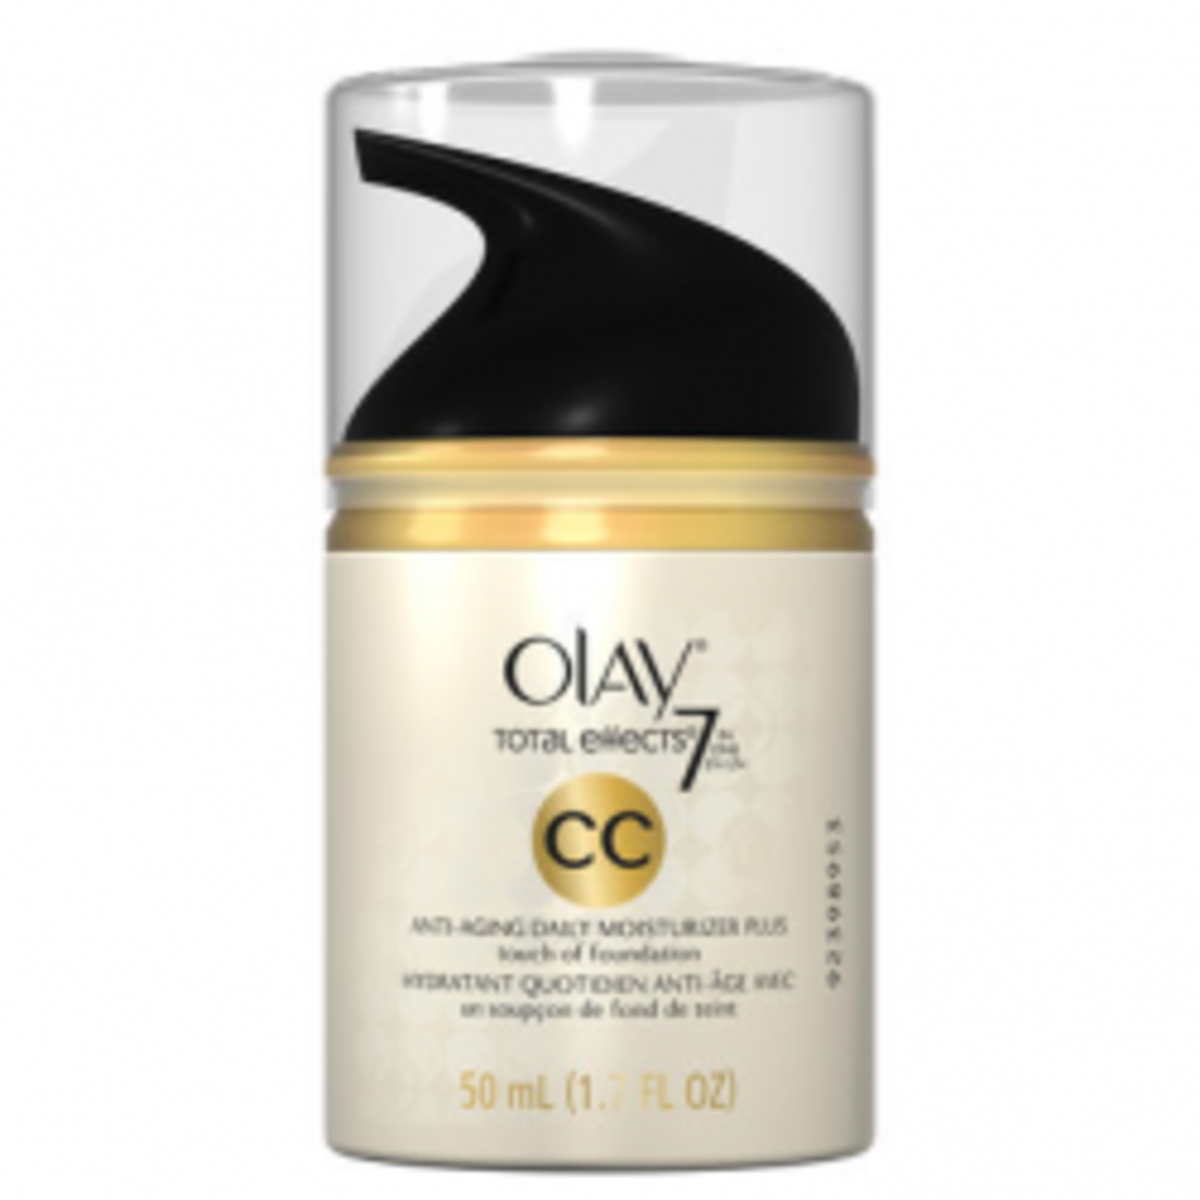 Olay CC Cream plus Moisturizer